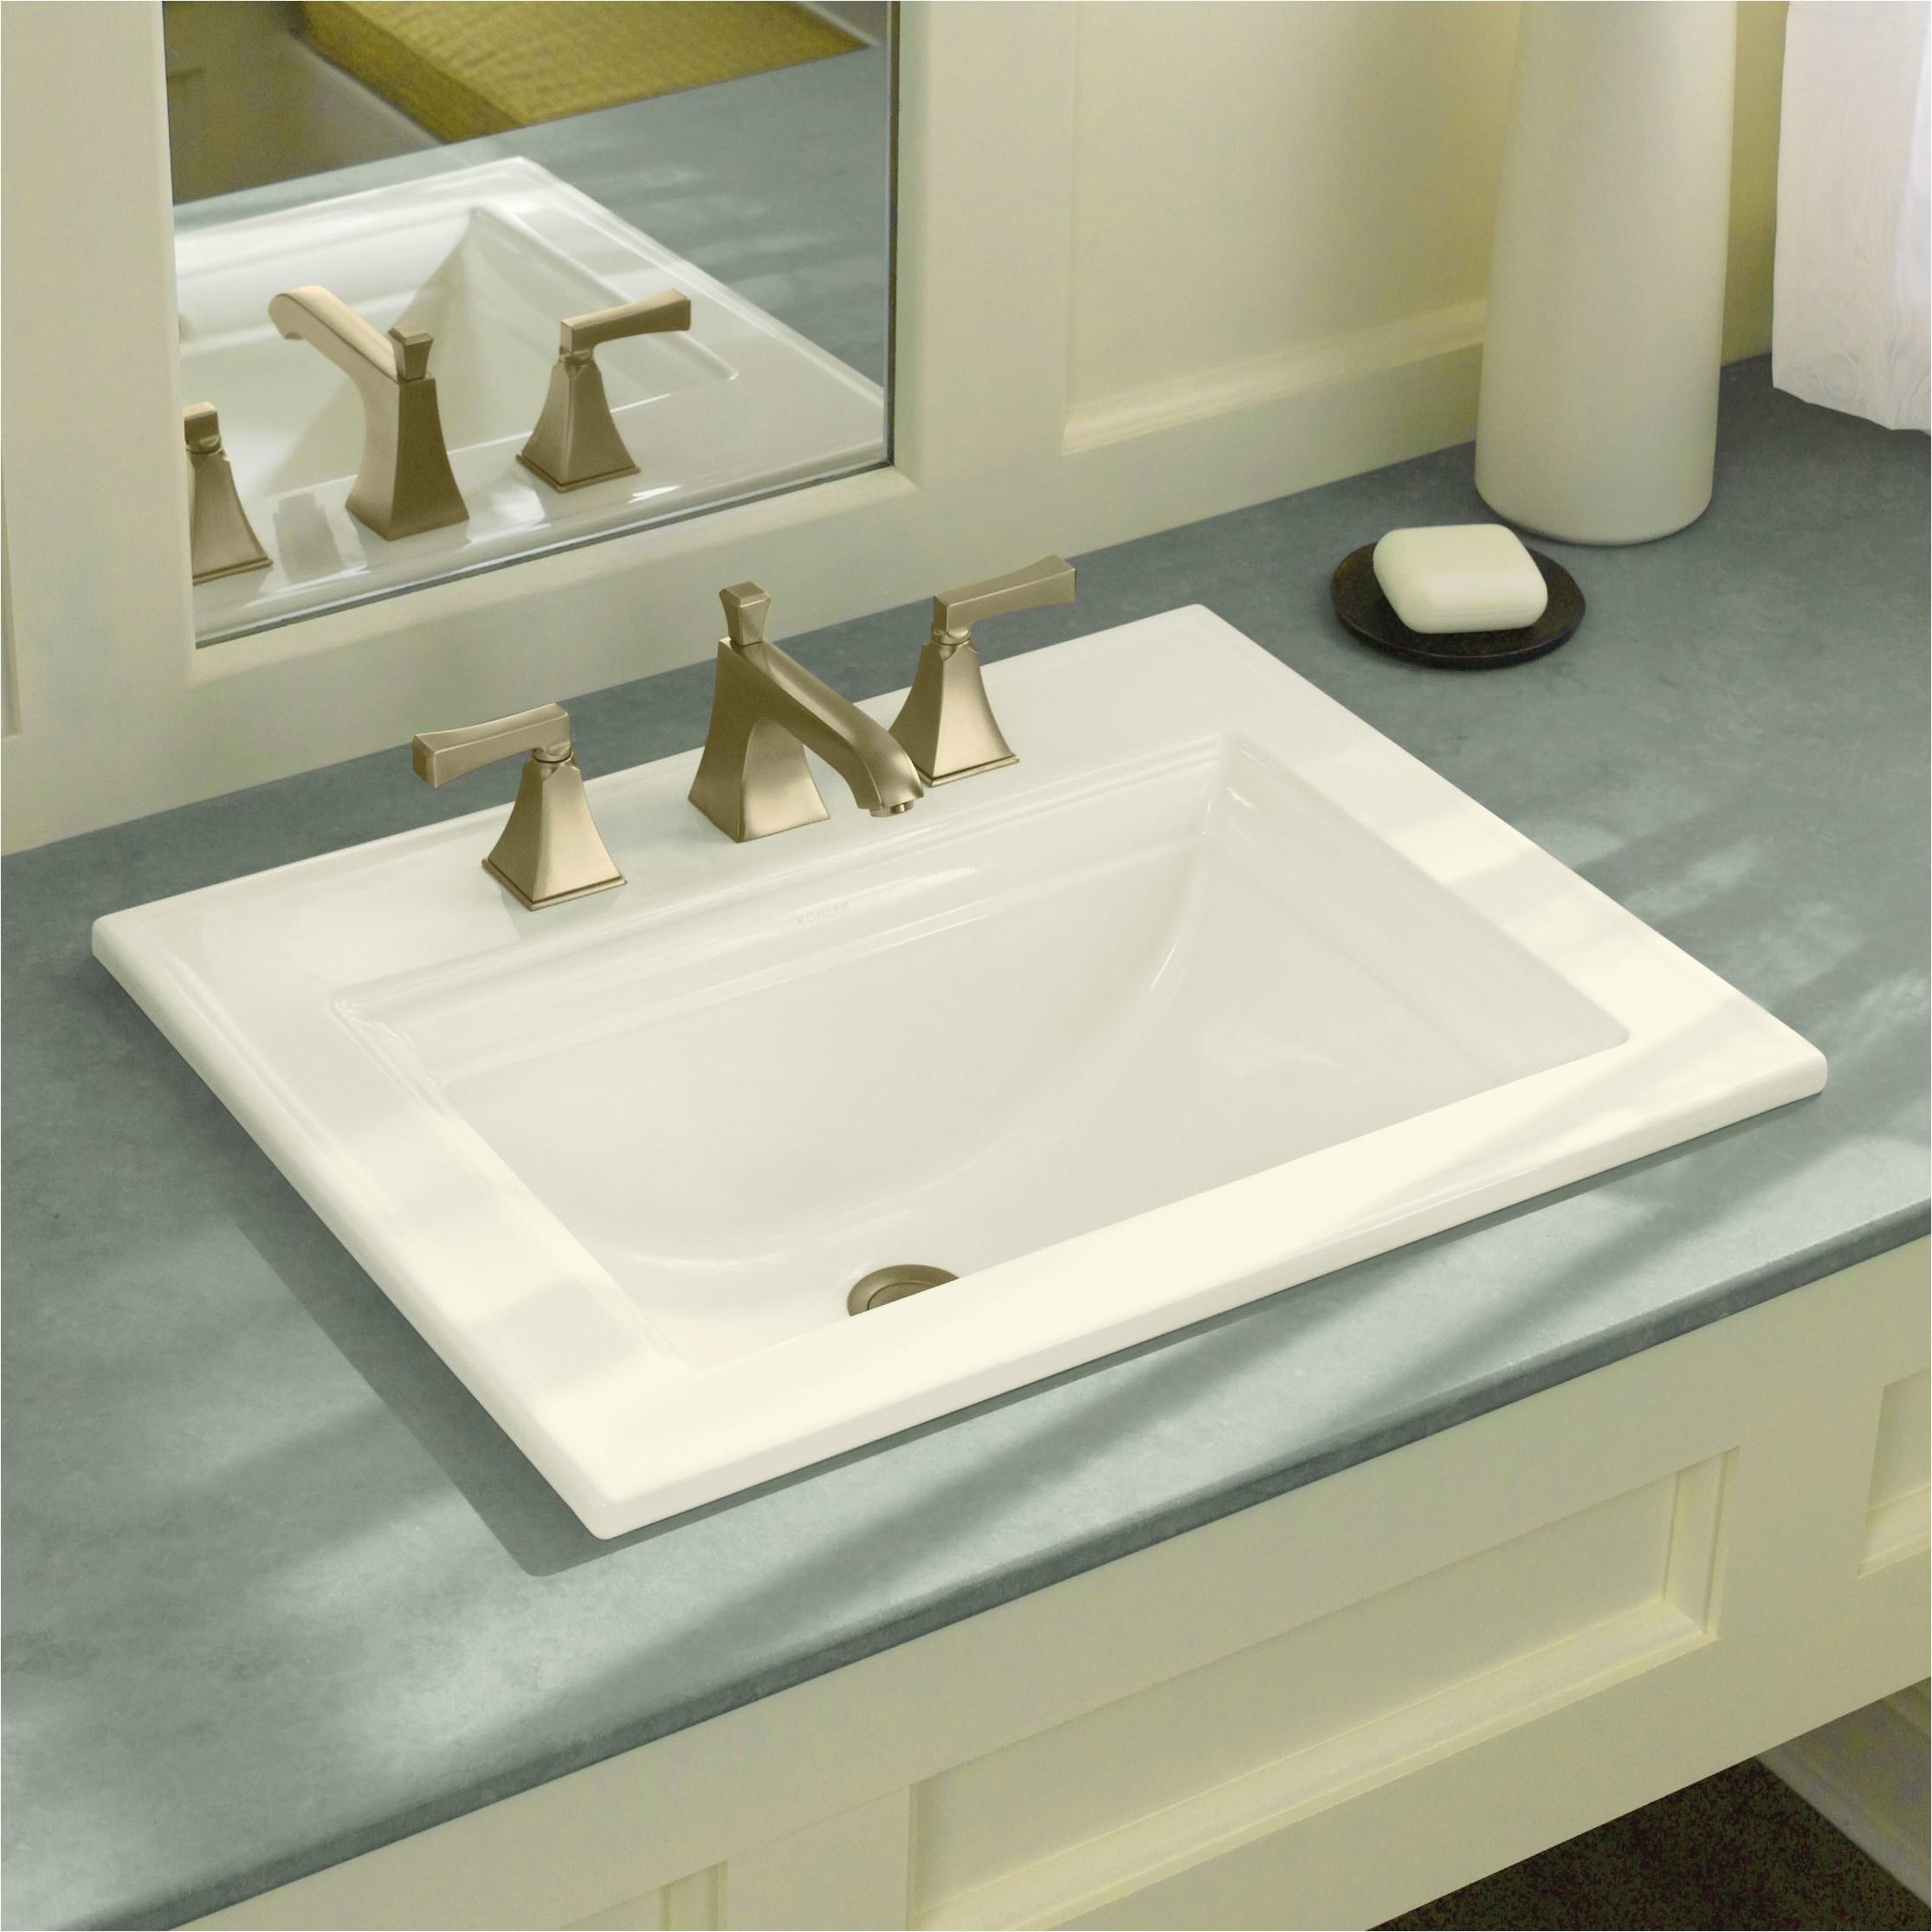 lowes bathroom tiles fresh 40 new bath liners lowes of lowes bathroom tiles lovely information lowes